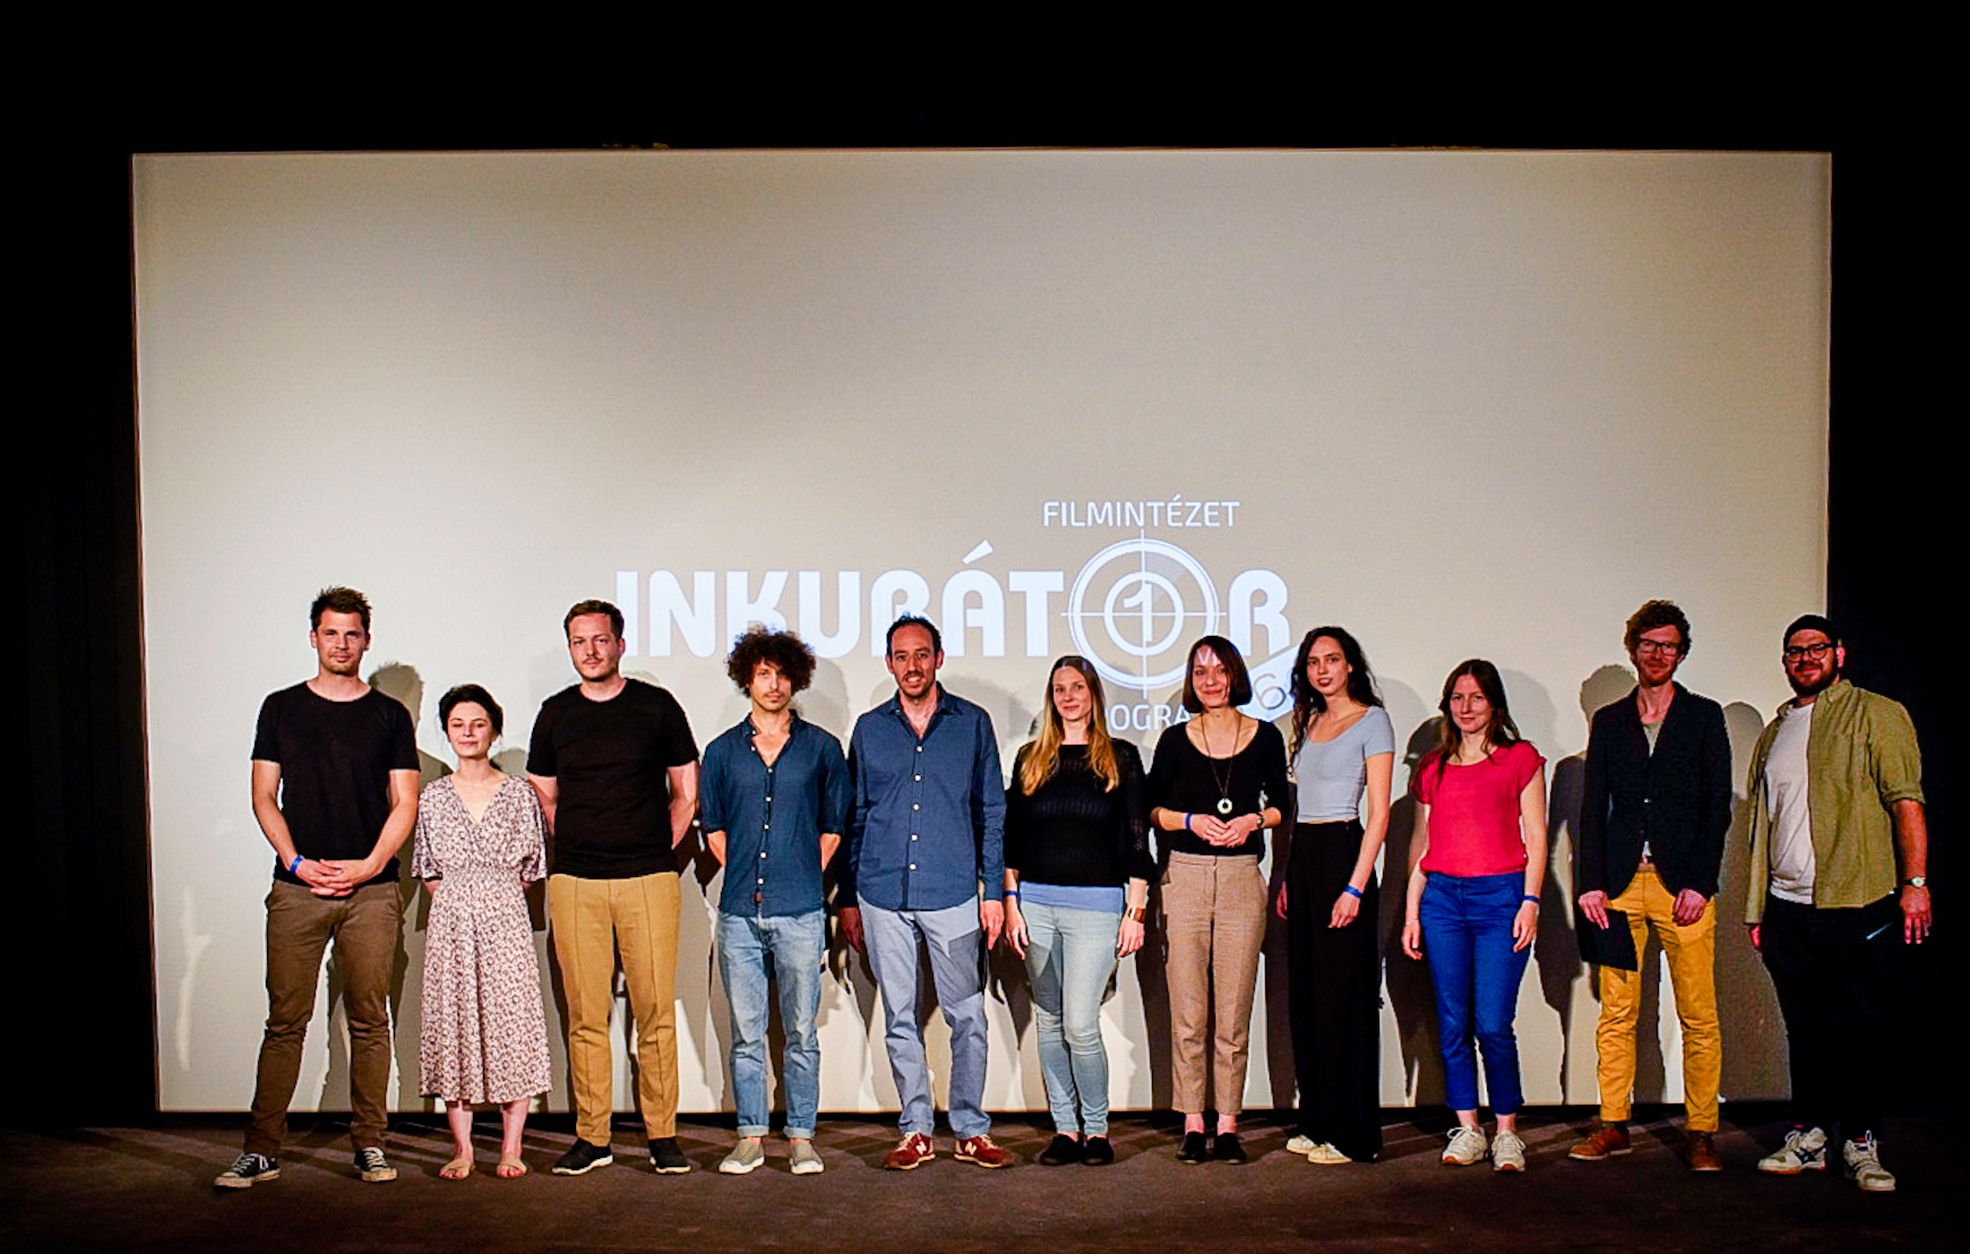 nemzeti filmintezet inkubator program 2021 nyertesek